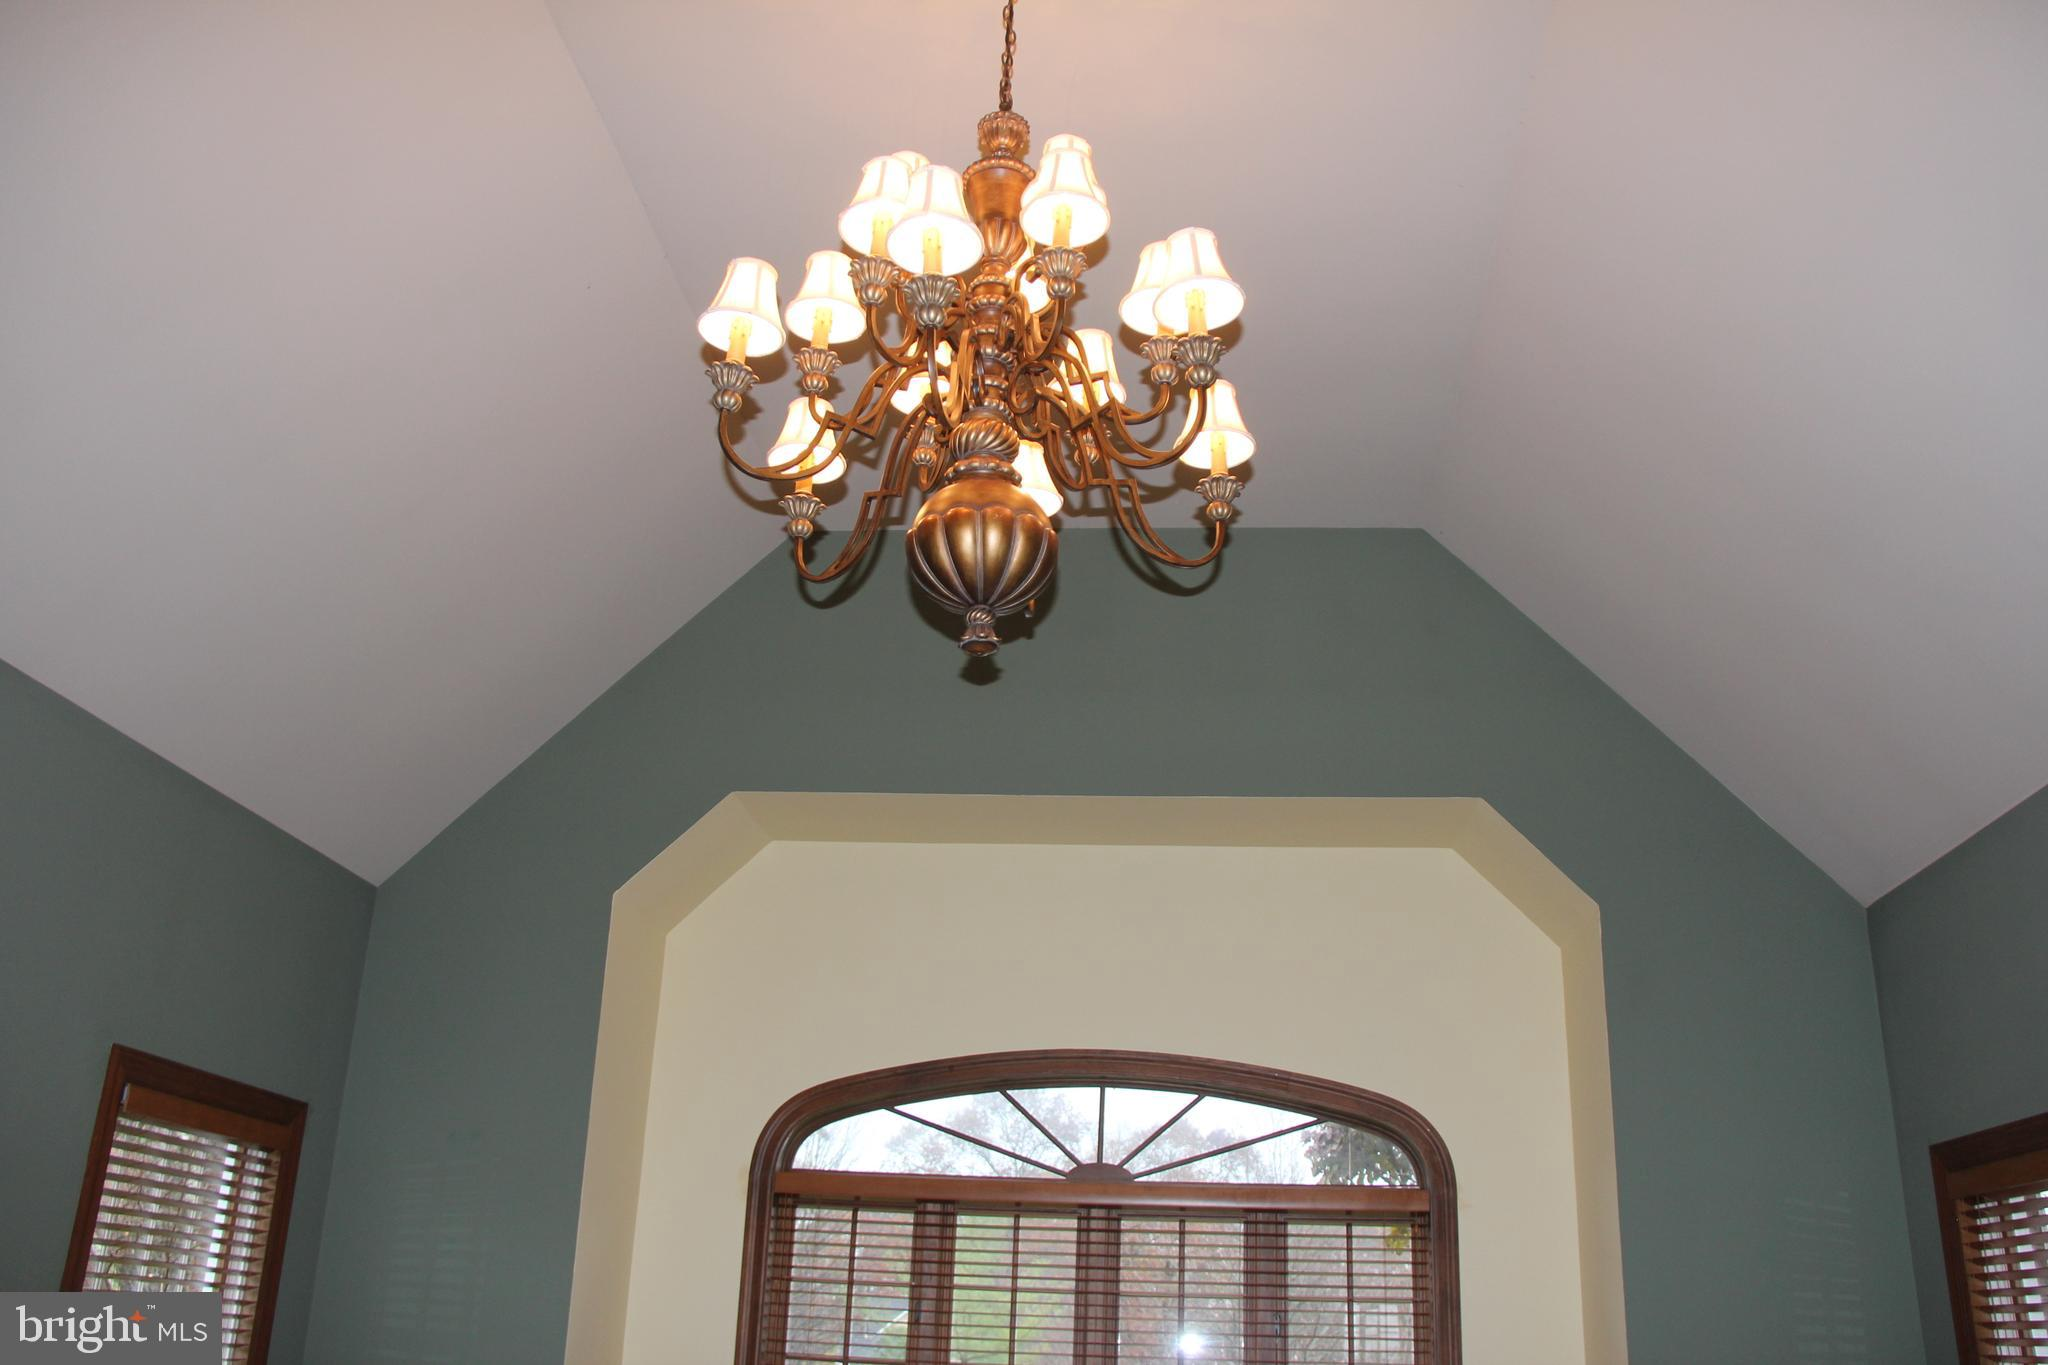 15 ft ceiling